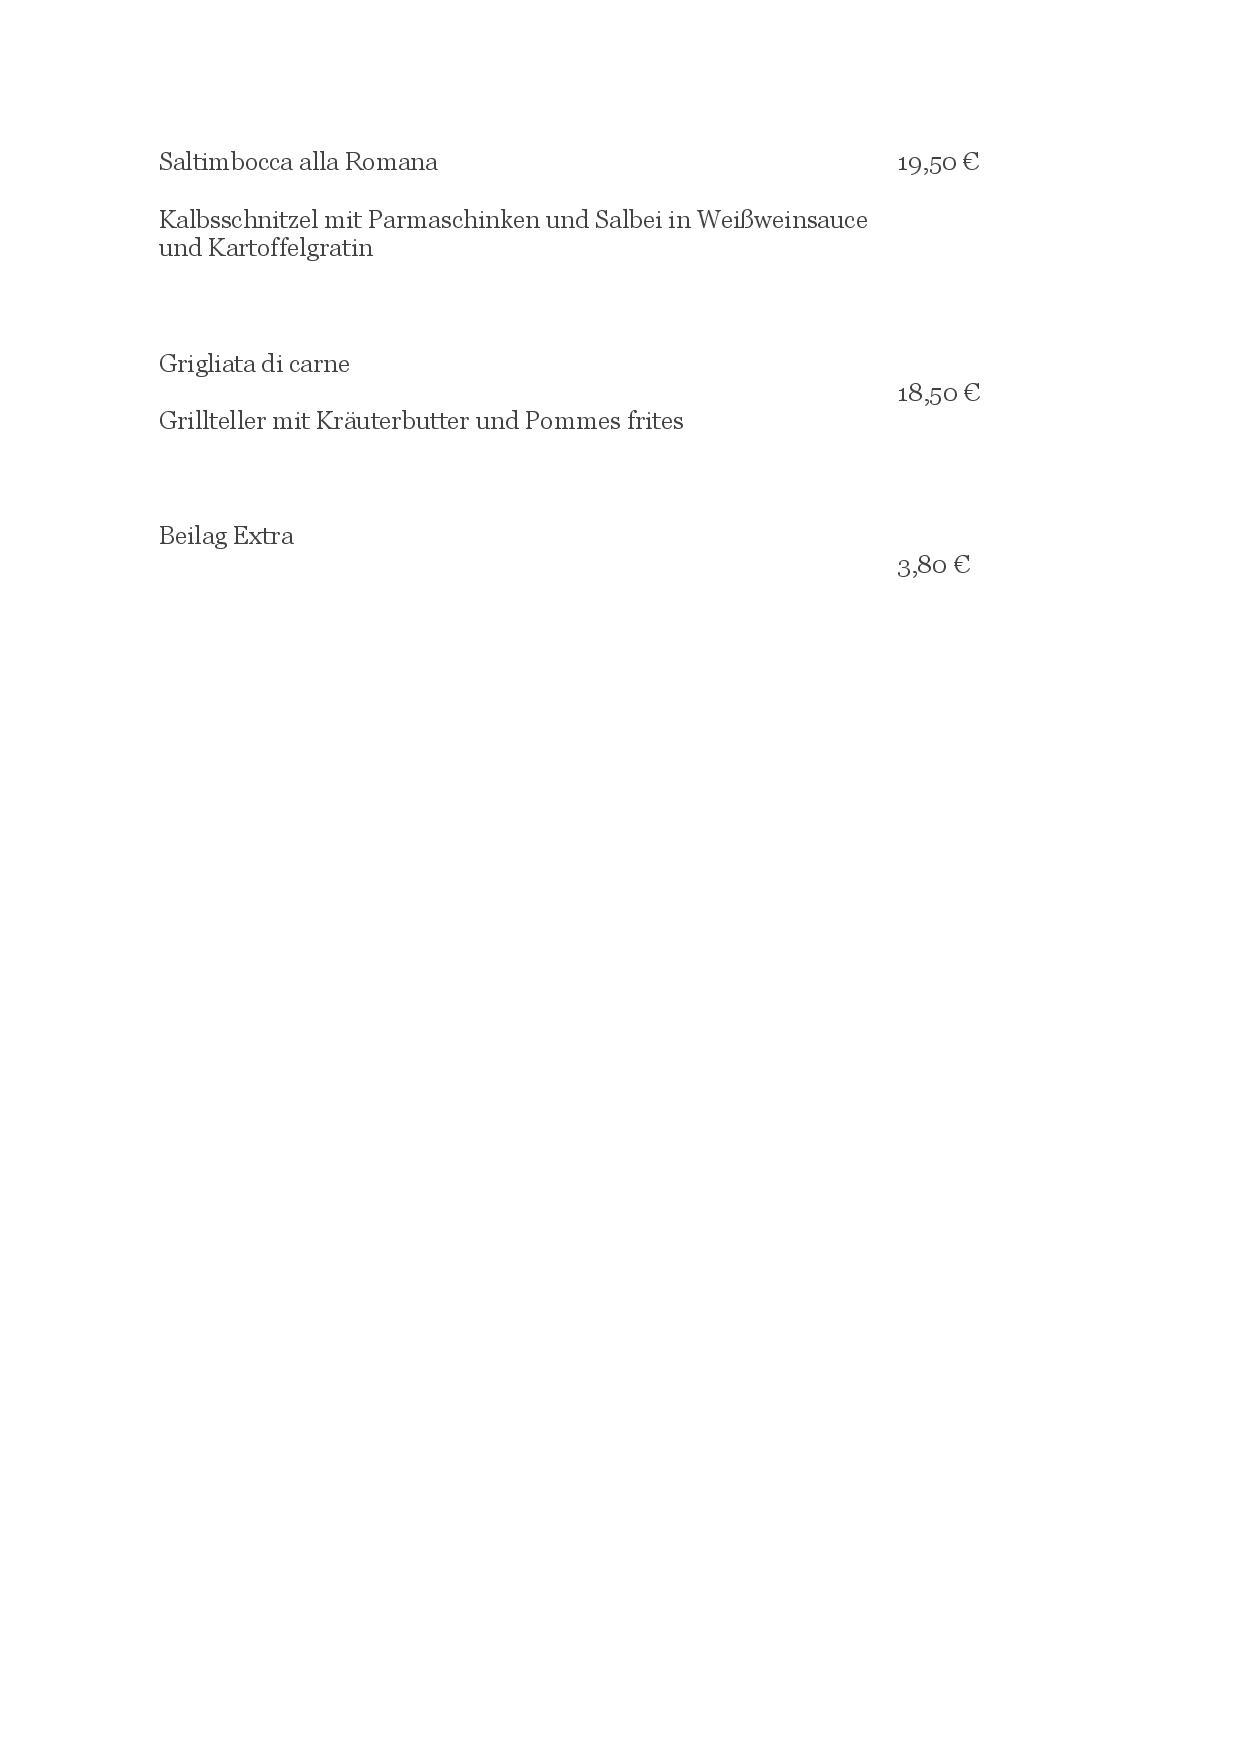 Speisekarte Baden Baden-page-005 (1)